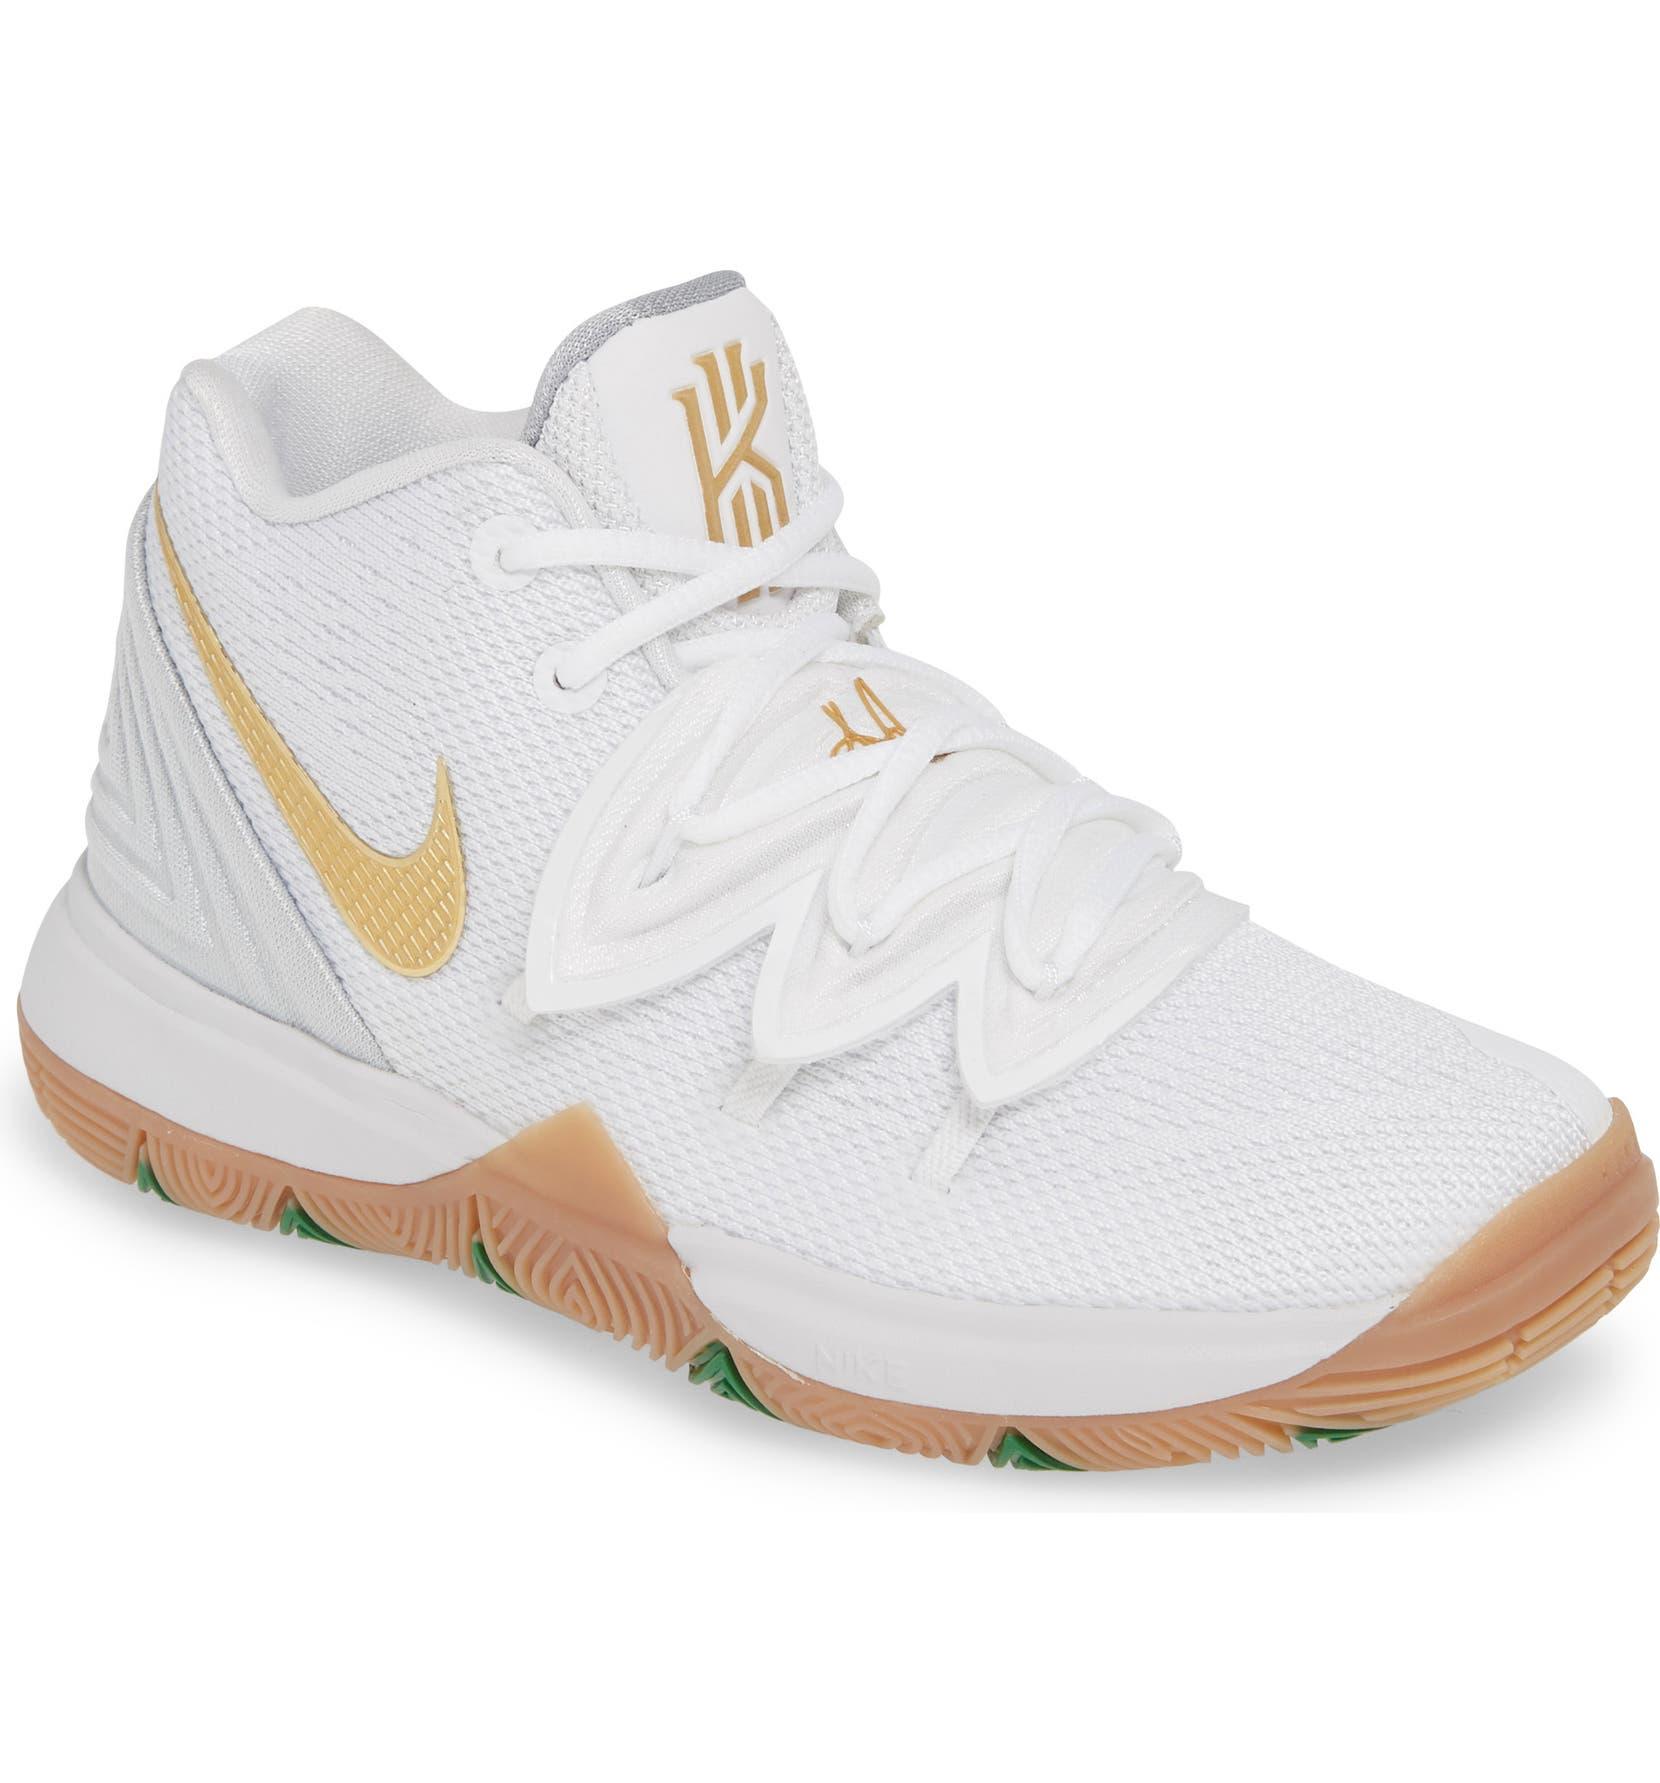 best service 690ad 4b5b8 Kyrie 5 Basketball Shoe